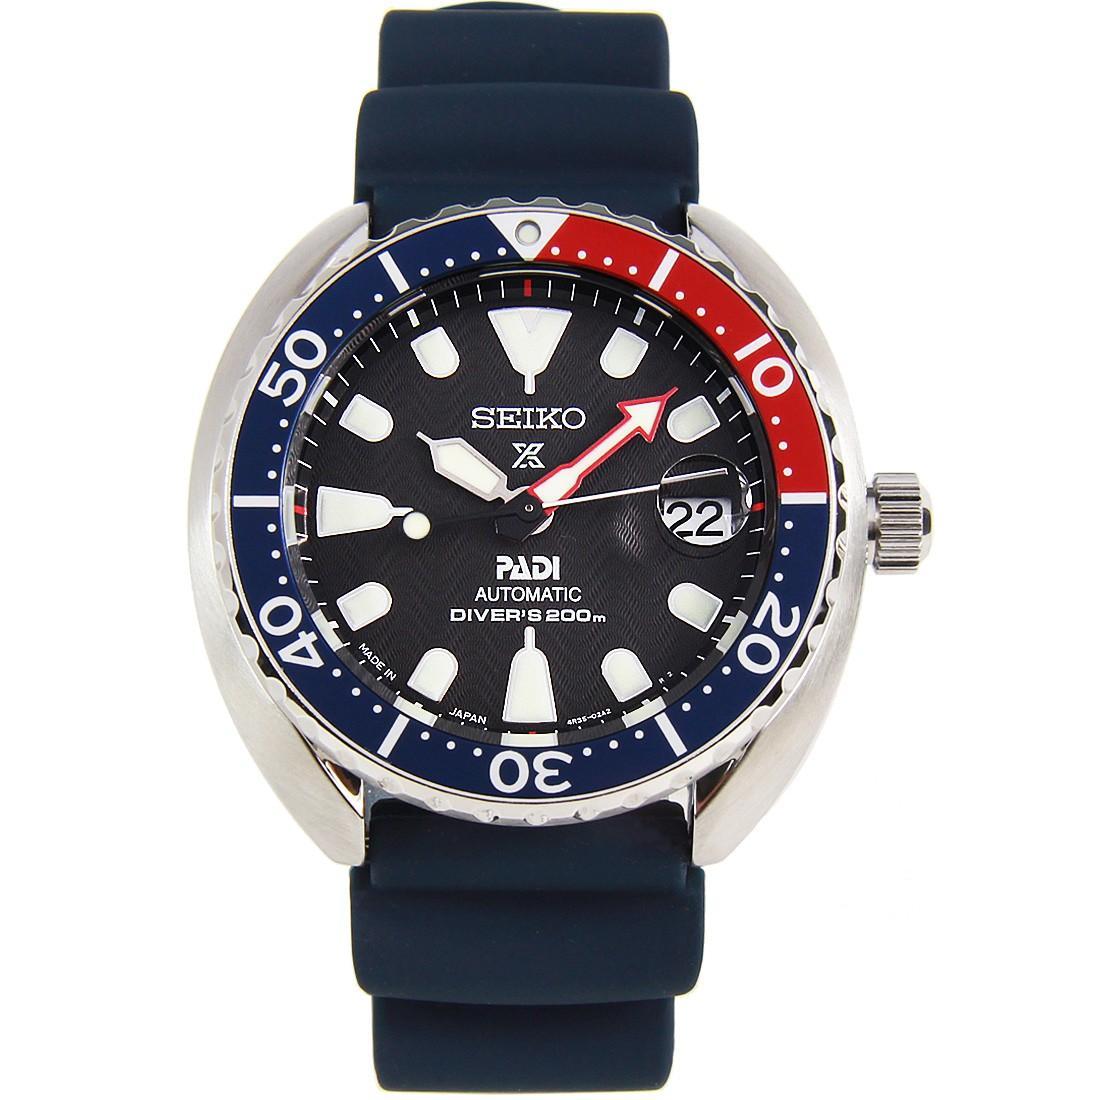 Seiko Prospex Padi Mini Baby Pepsi Turtle Diver Scuba Watch SRPC41 SRPC41J SRPC41J1